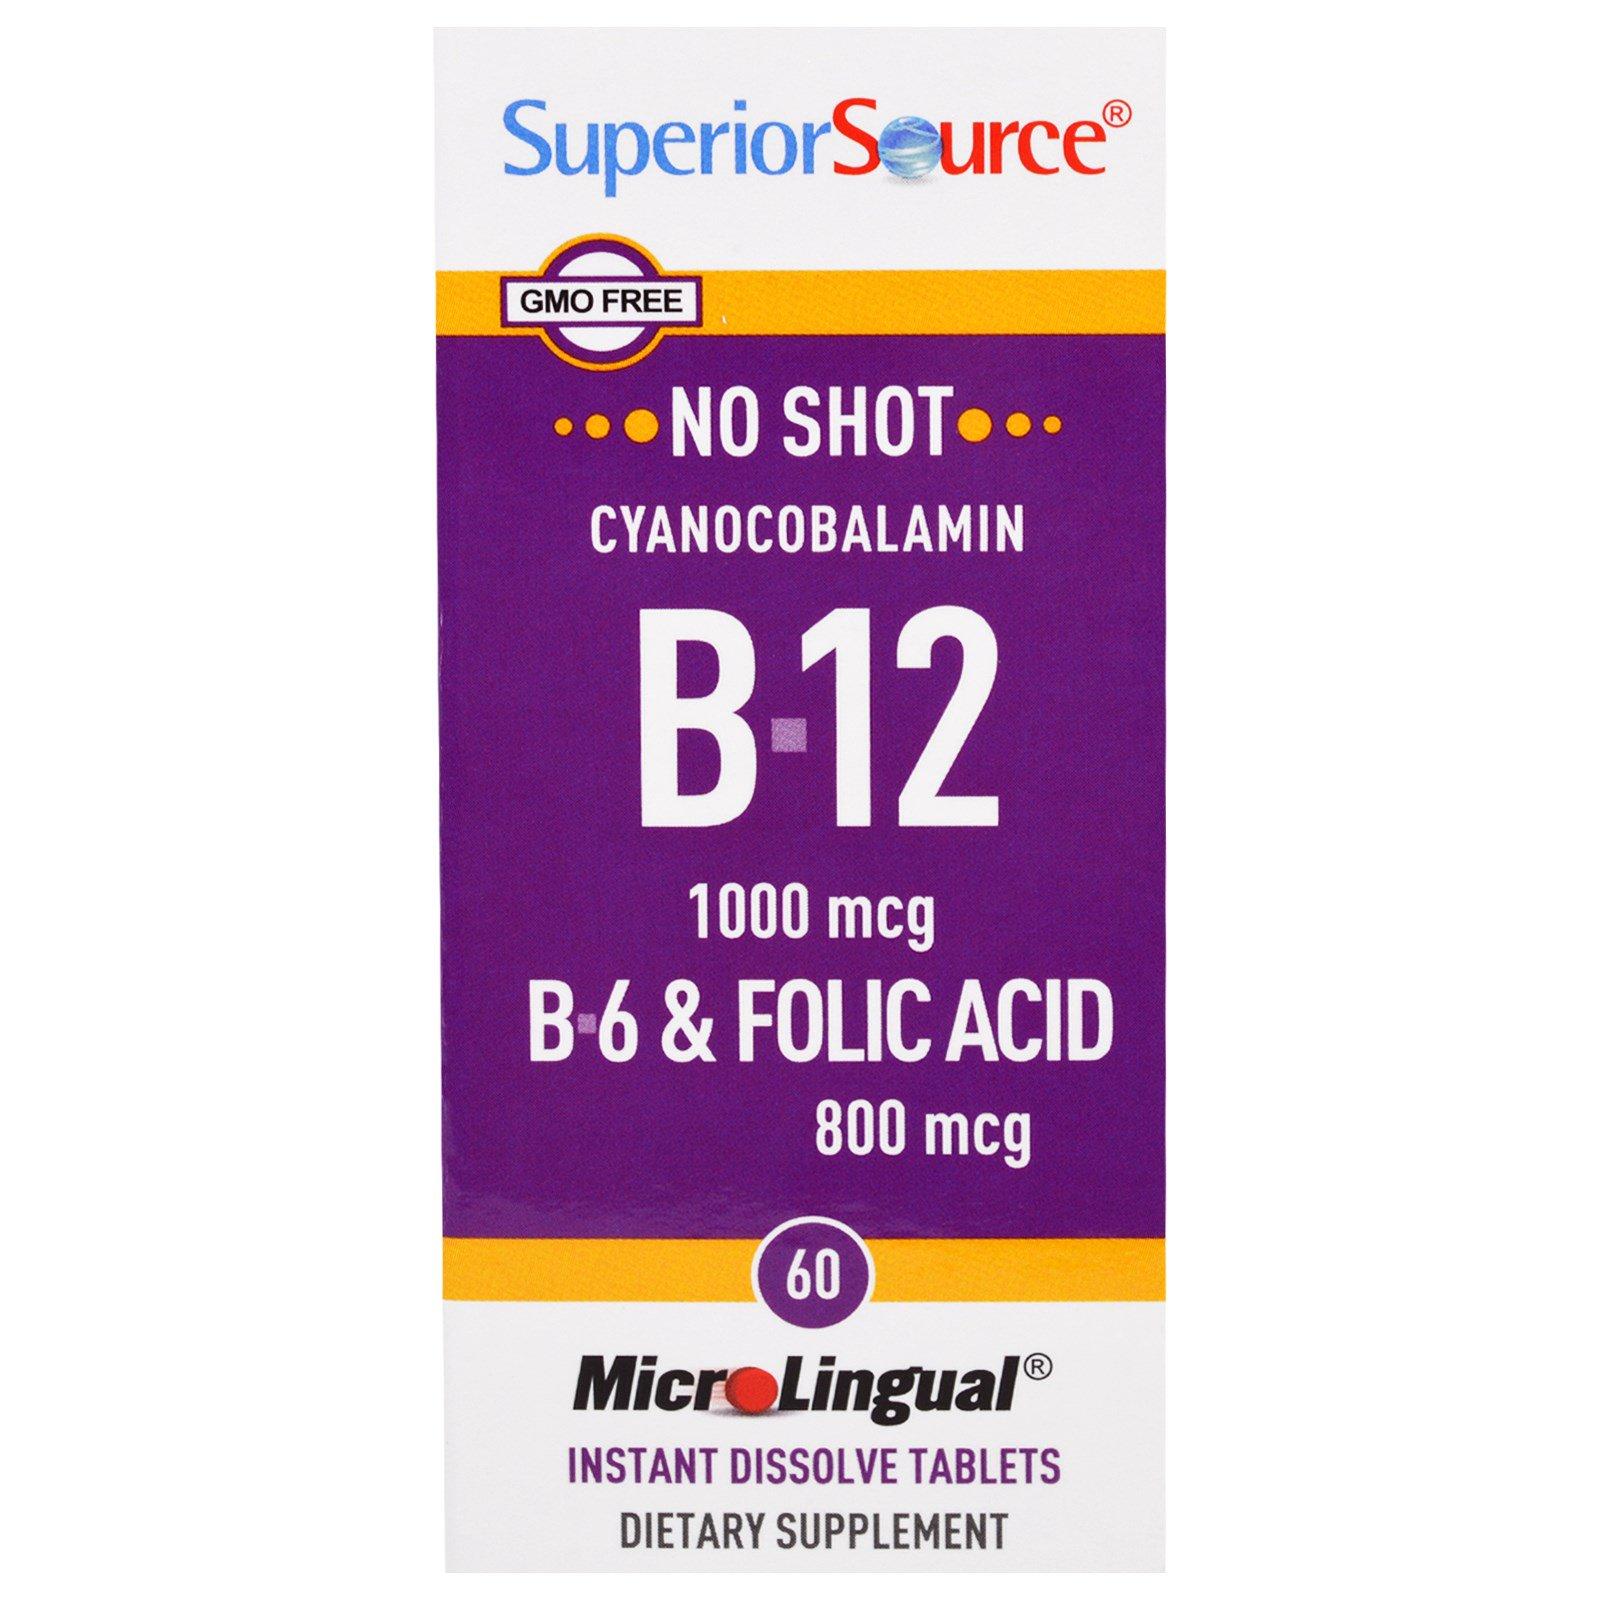 Superior Source, MicroLingual, цианокобаламин B-12 1000 мкг, B-6 и фолиевая кислота 800 мкг, 60 быстрорастворимых таблеток